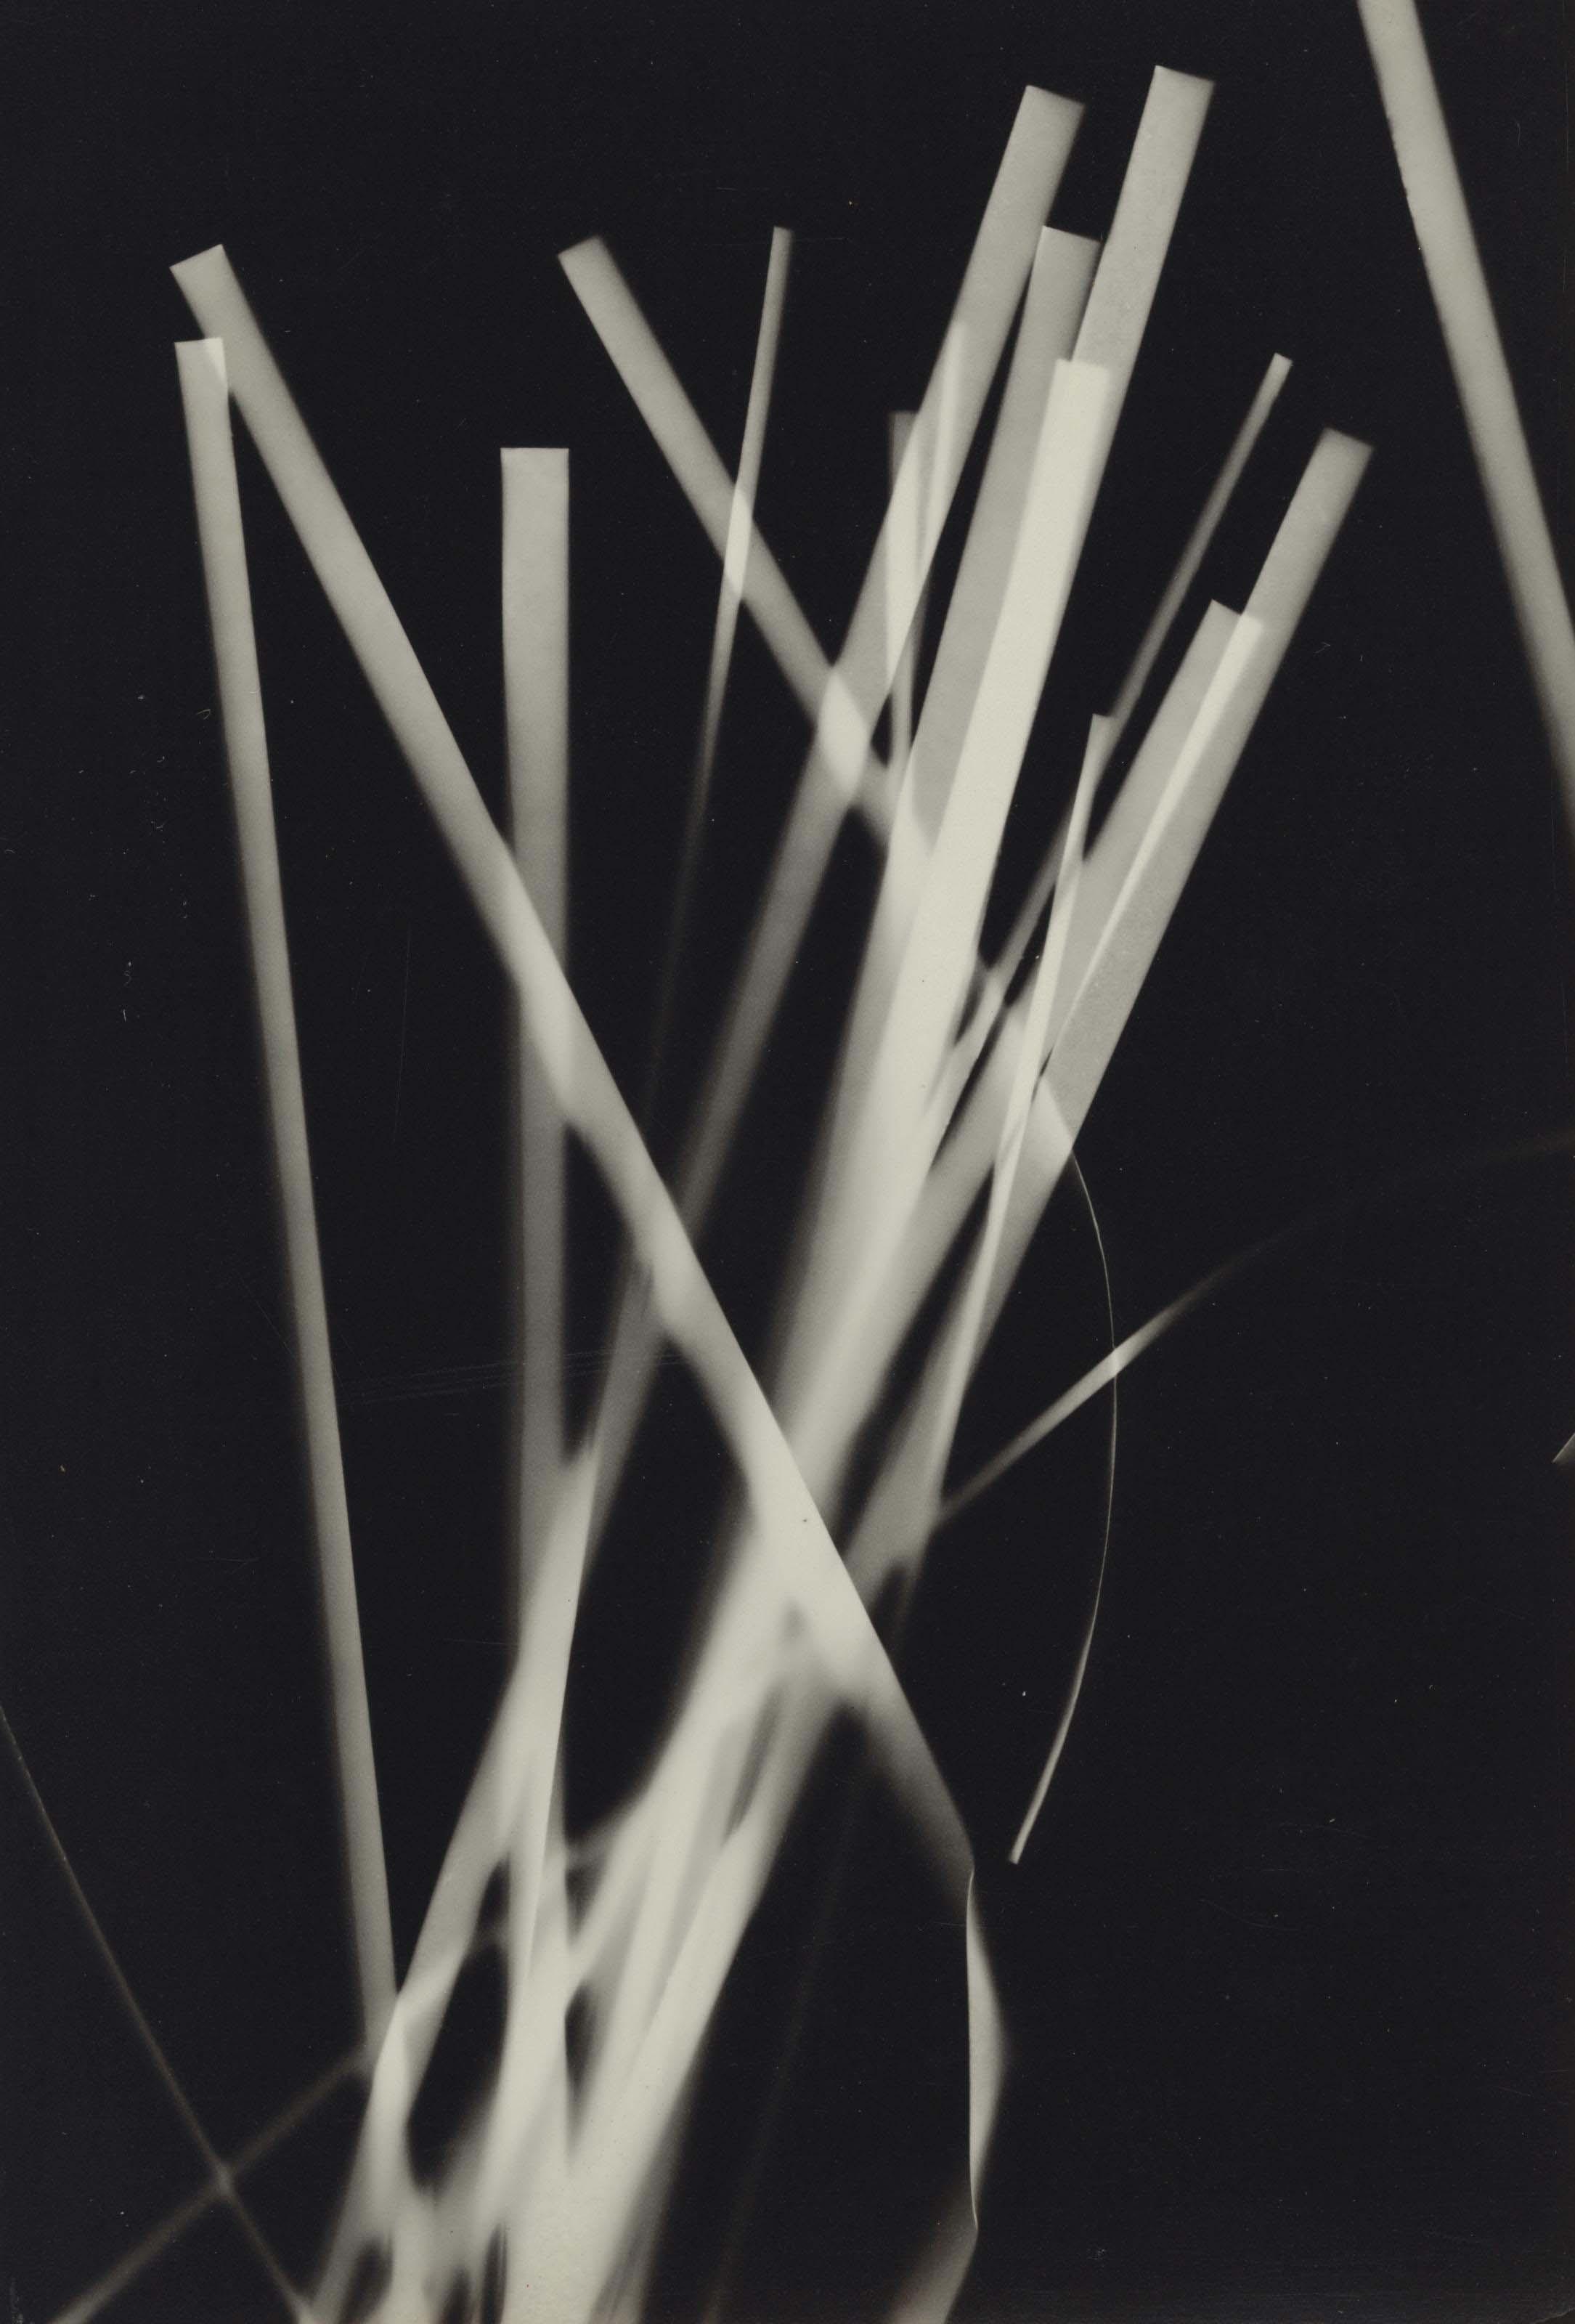 Untitled, 1930